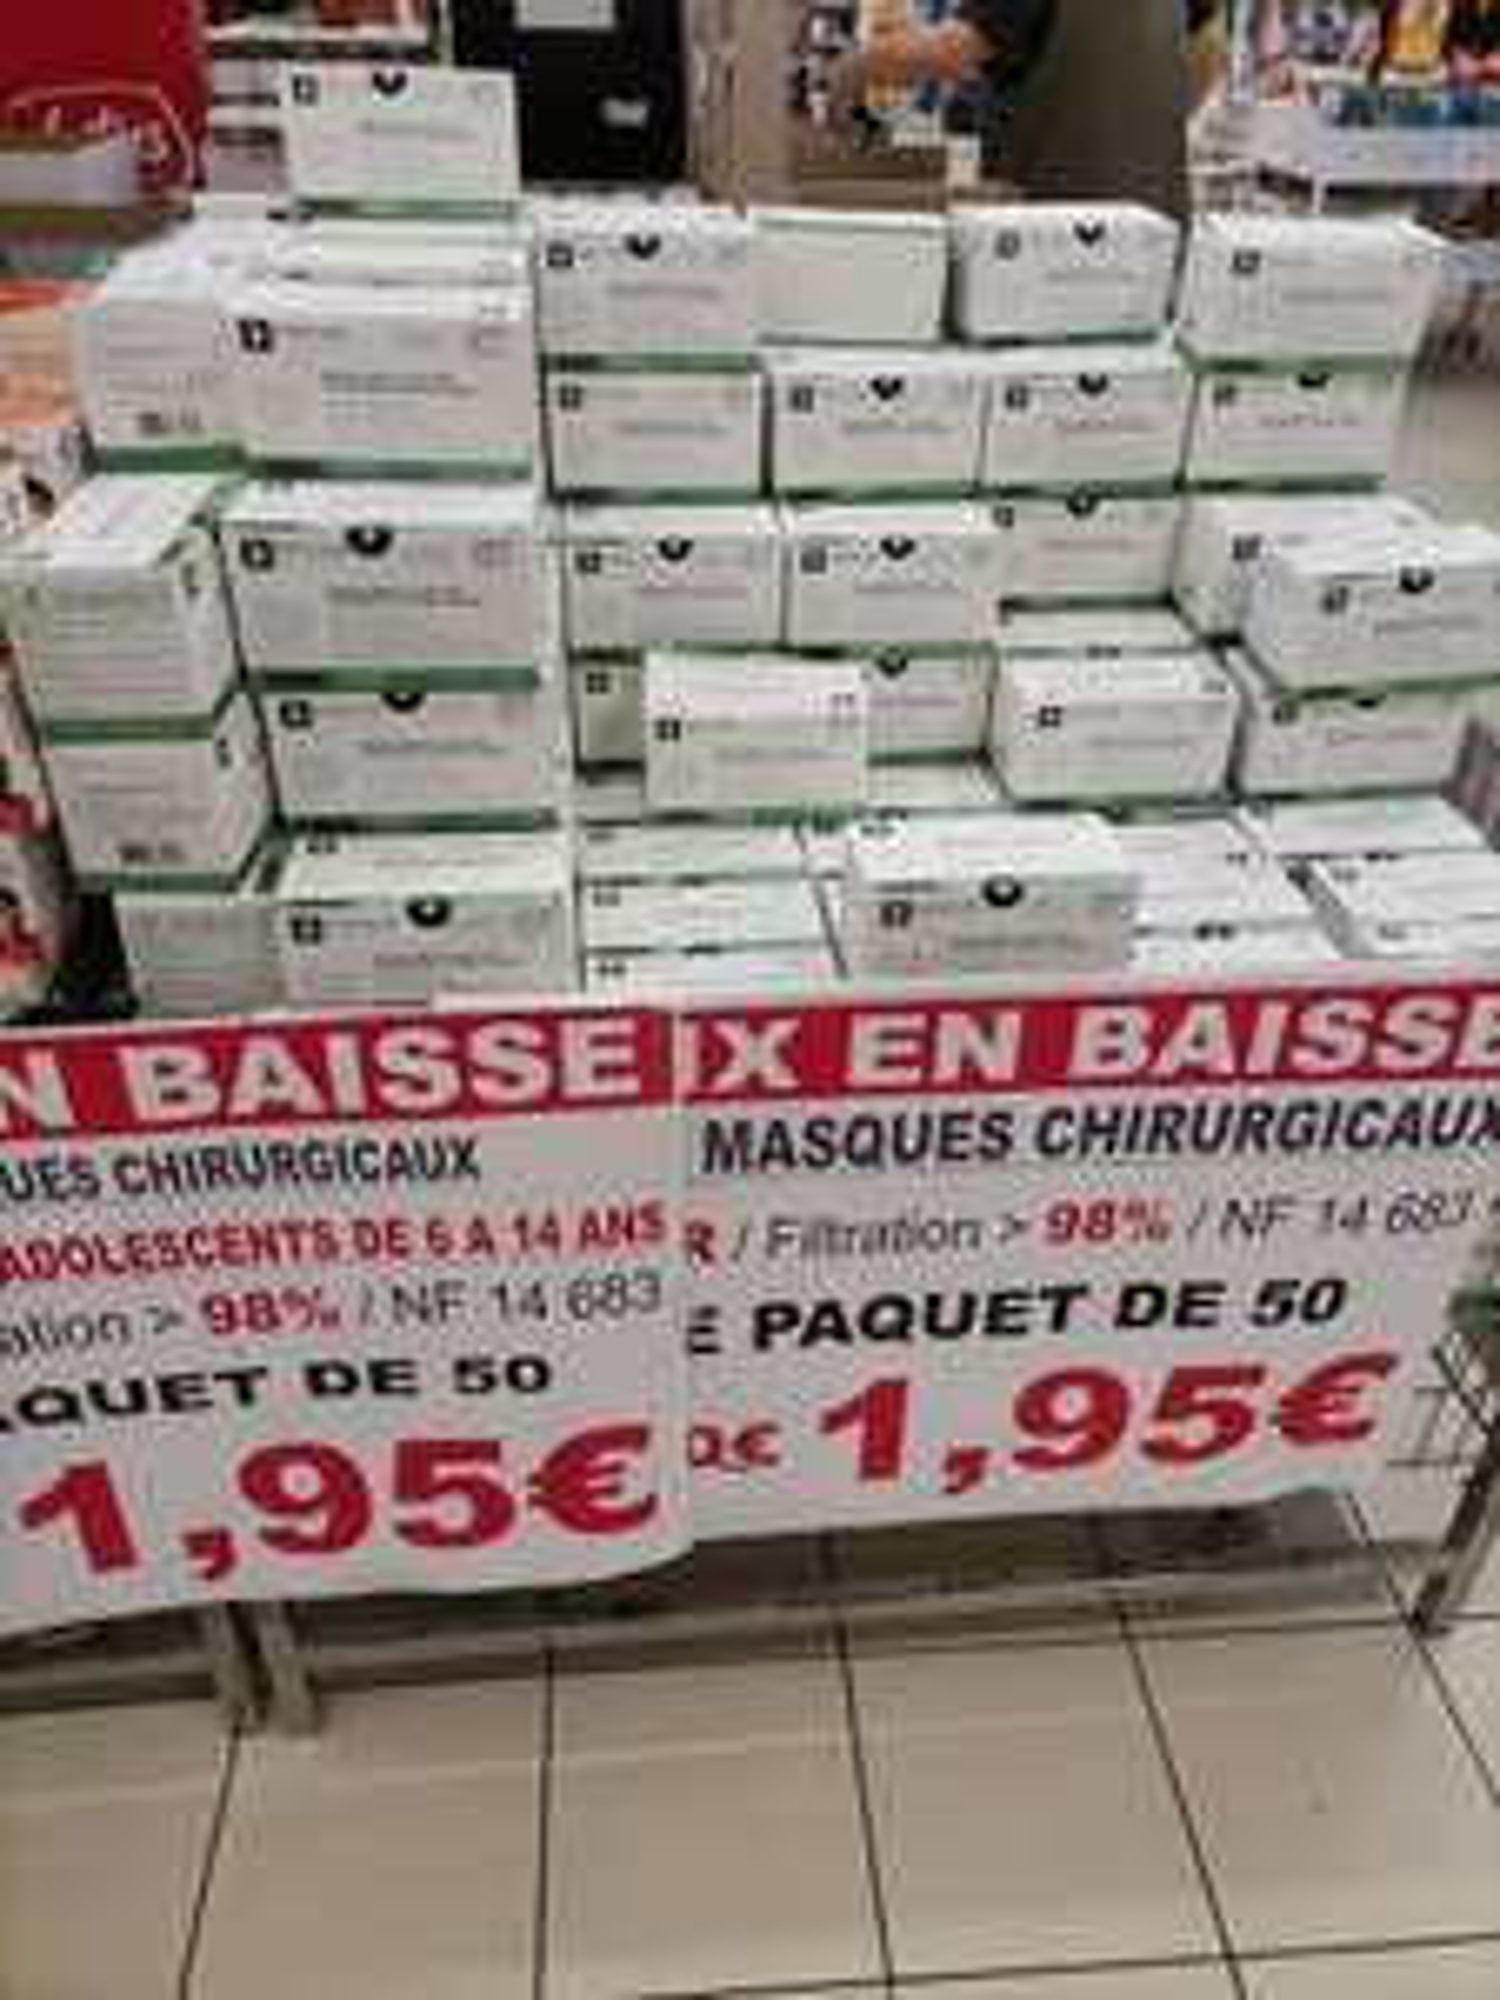 Boite de 50 Masques chirurgicaux - Mulhouse (68)